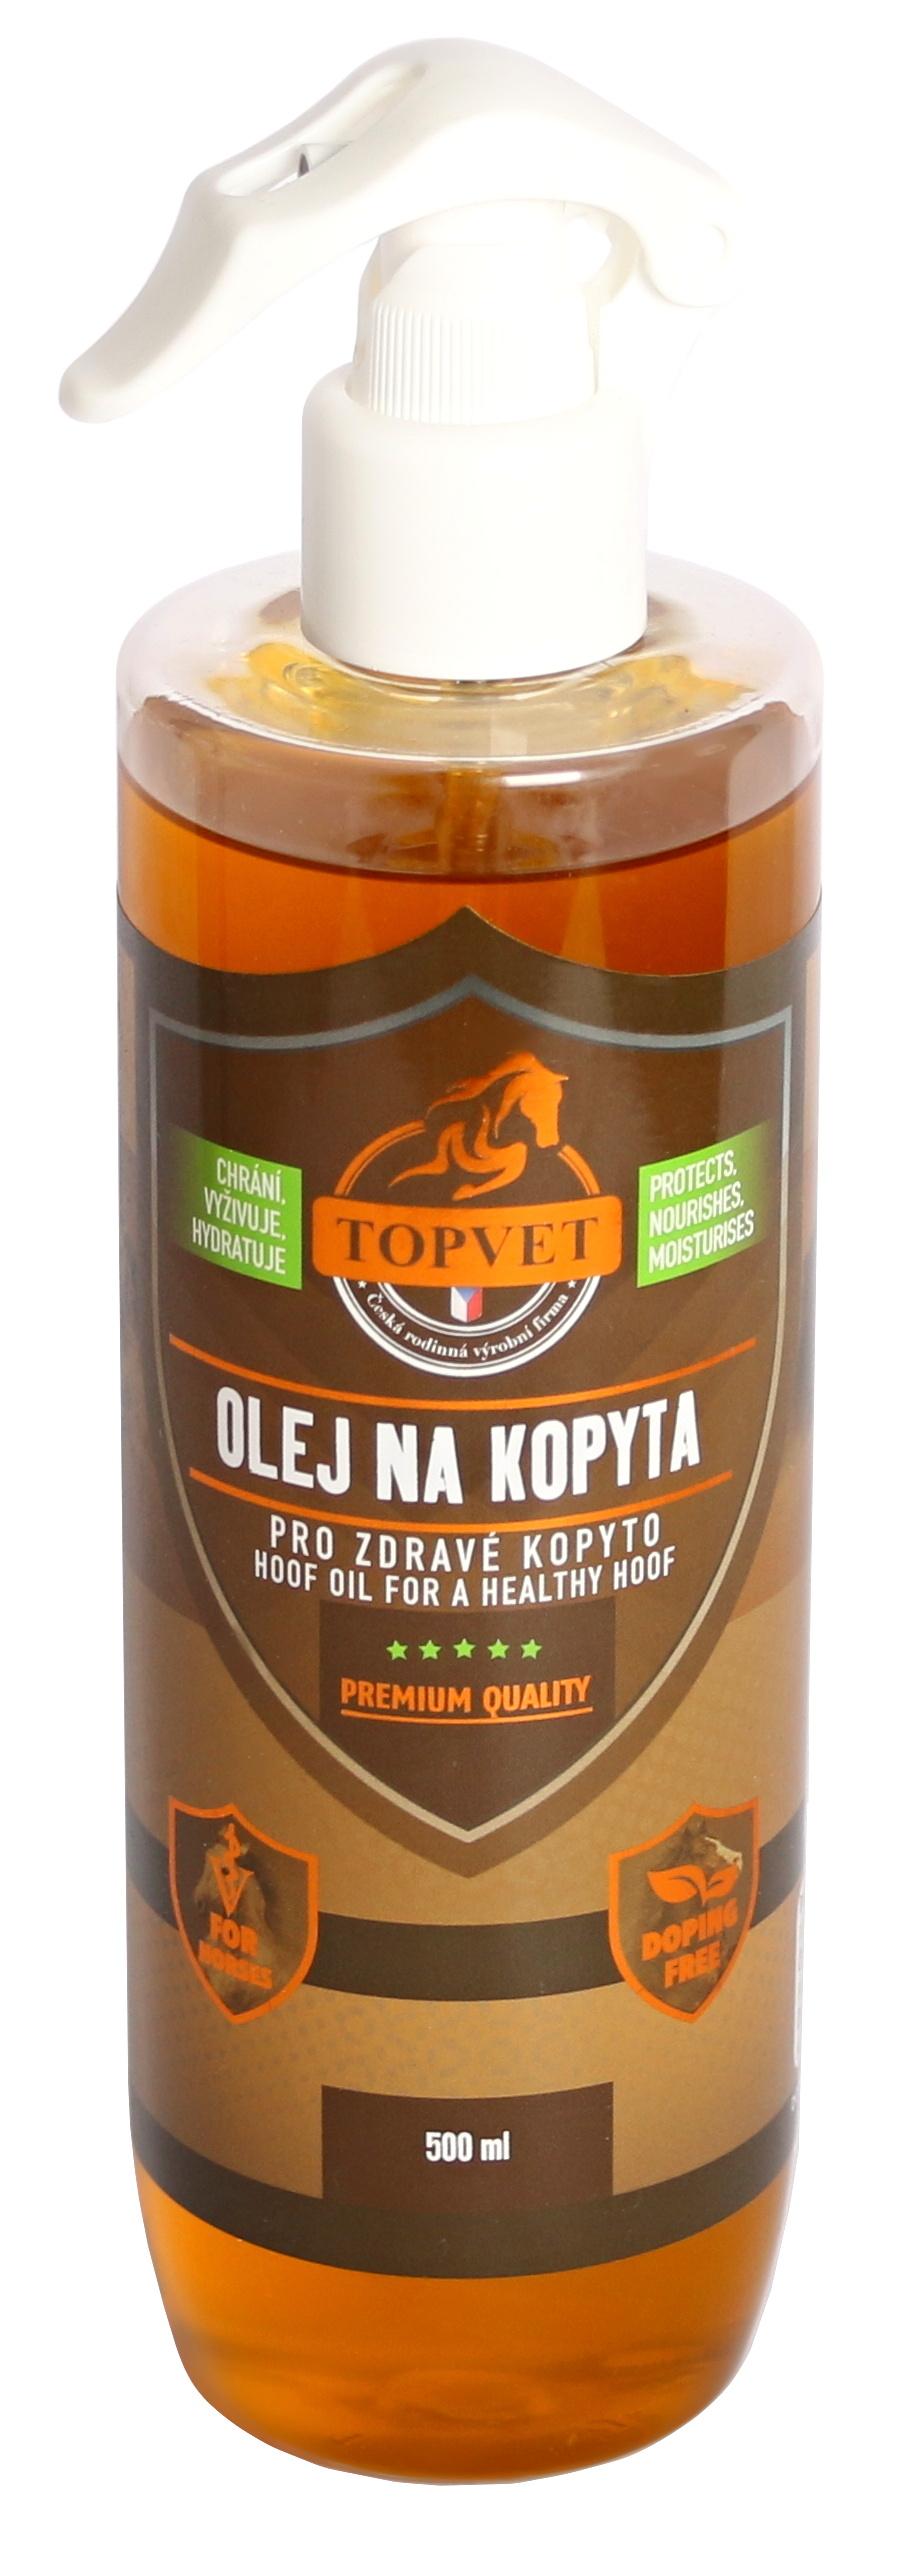 Topvet Olej na kopyta - pro zdravé kopyto 500ml